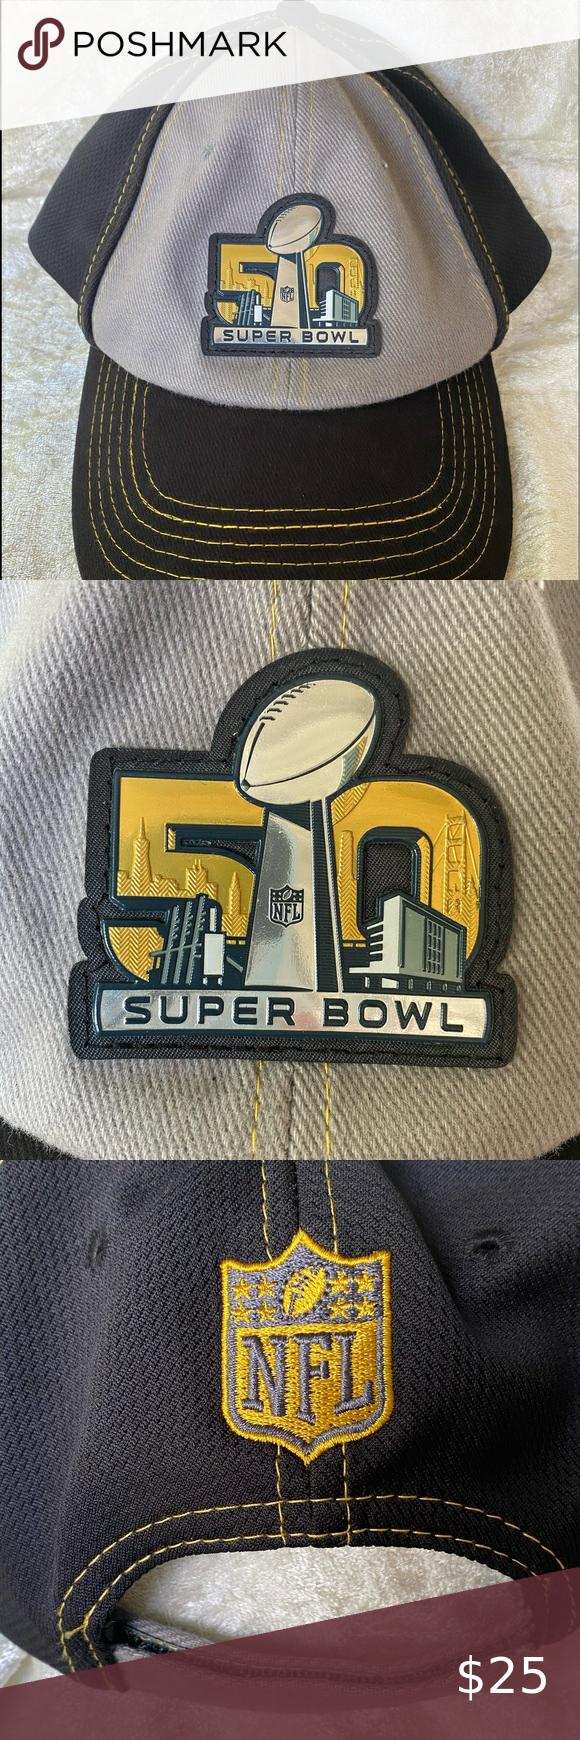 Super Bowl 50 Nfl Hat Denver Vs Carolina Good Cond Nfl Hats Super Bowl Nfl